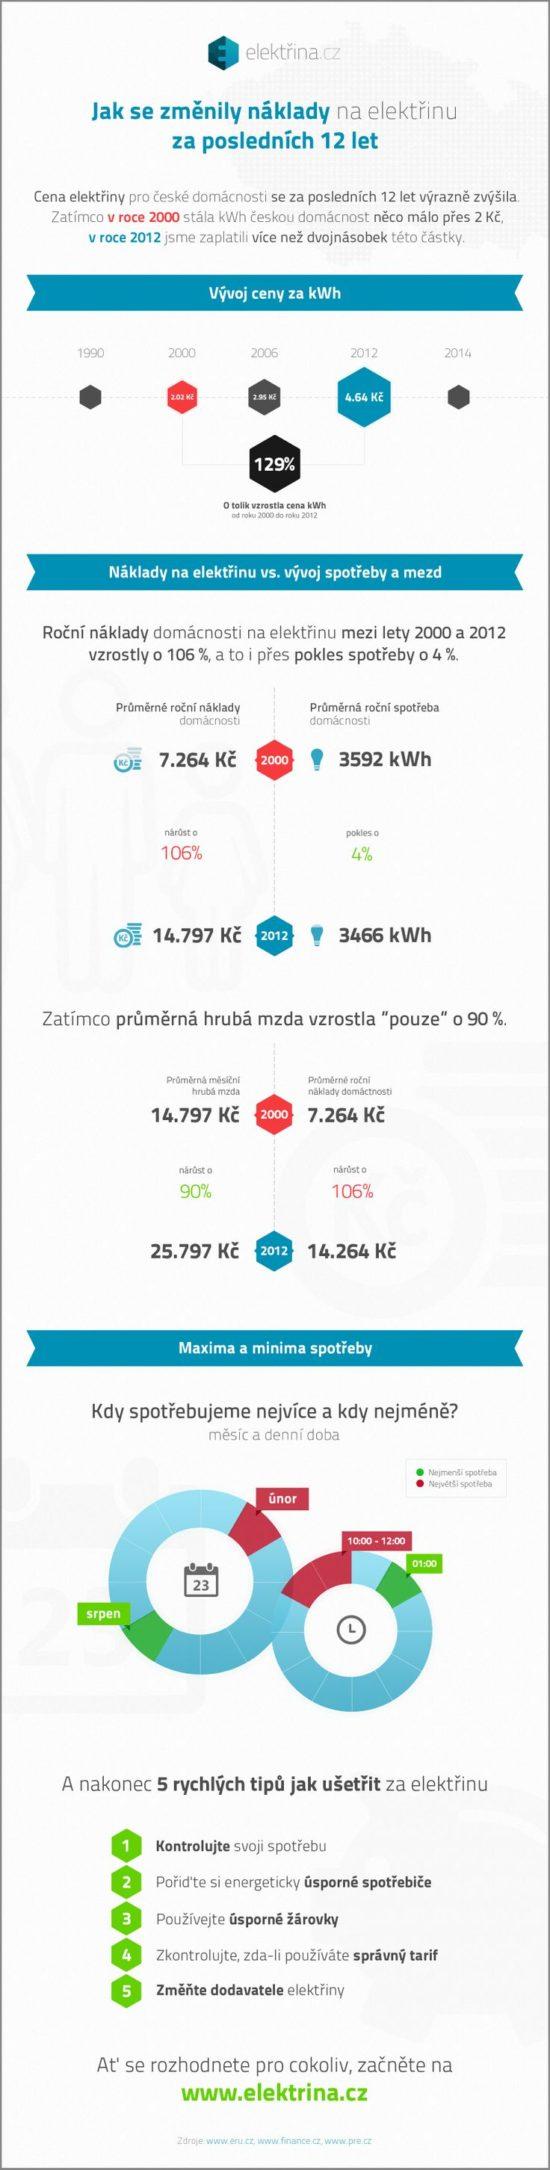 Jak se zmenily naklady na elektrinu za poslednich 12 let - infografika